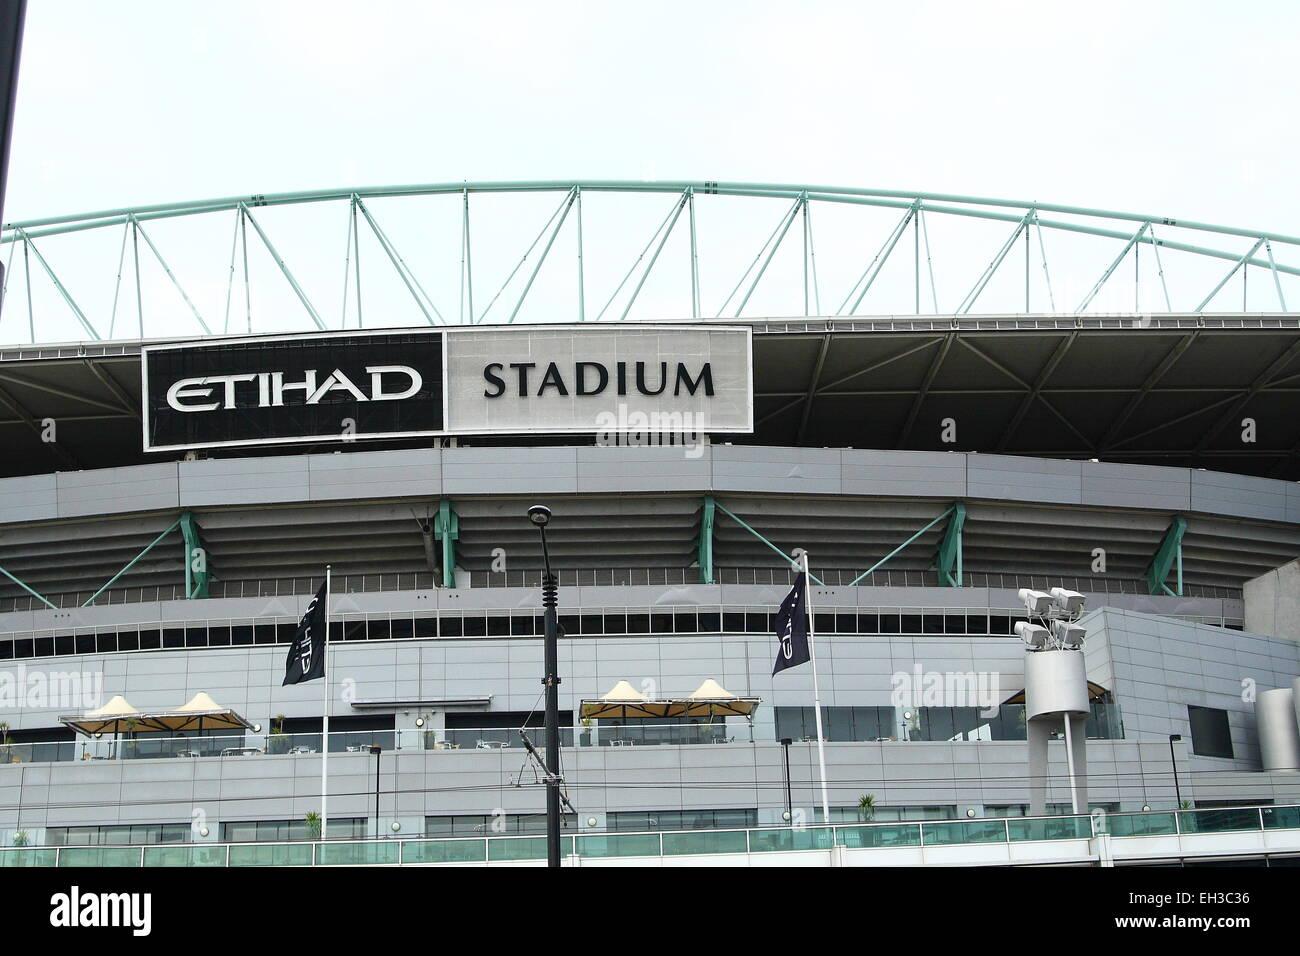 Etihad Stadium Melbourne Australia Stock Photo - Alamy